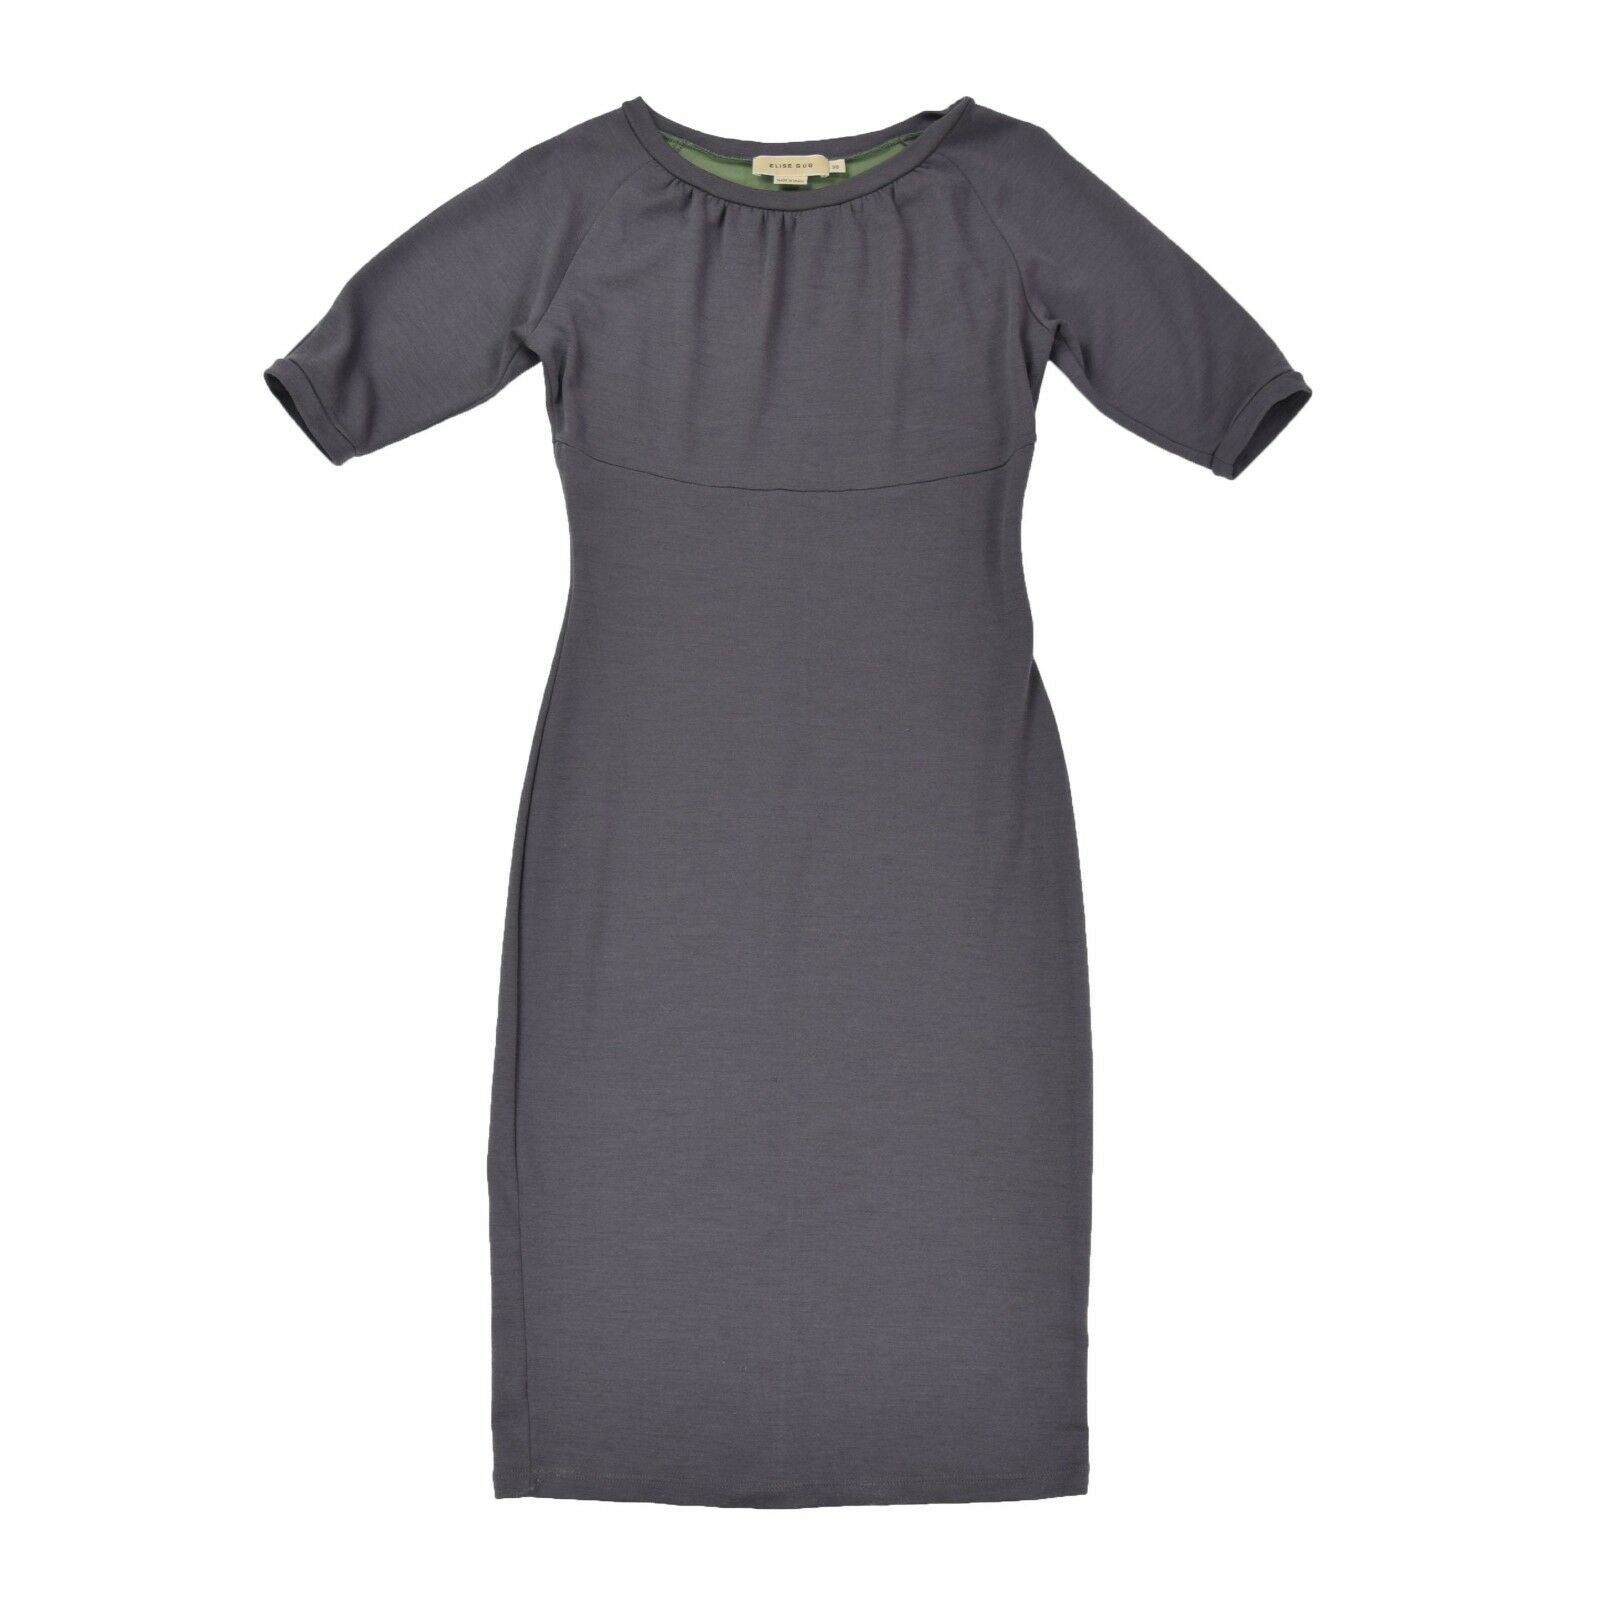 ELISE GUG Damen Kleid M 38 grau Wolle Woman Dress Skirt Strechkleid wie NEU